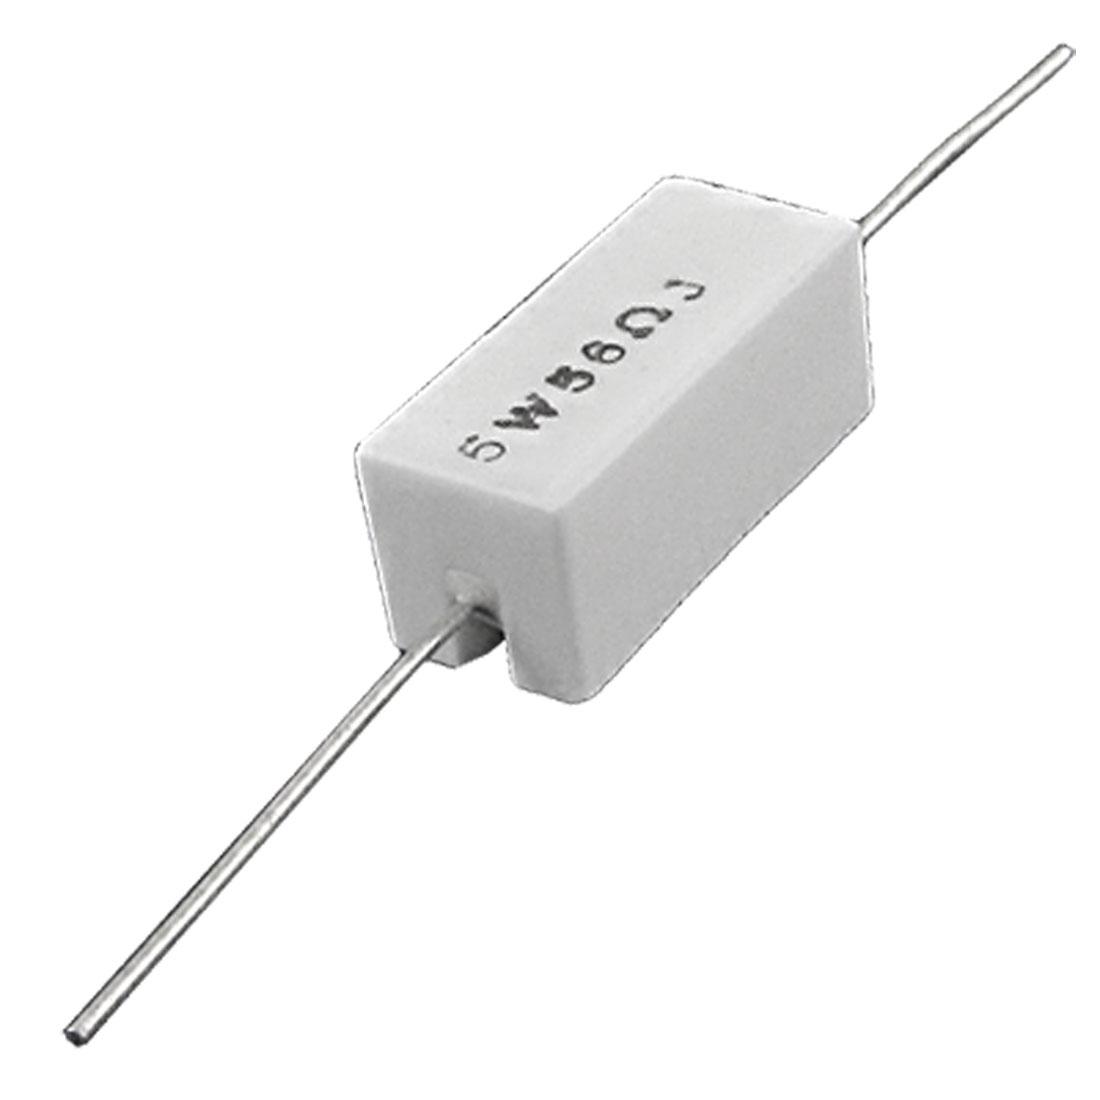 56 R Ohm 5% 5W Watt Ceramic Cement Power Resistor x10pcs